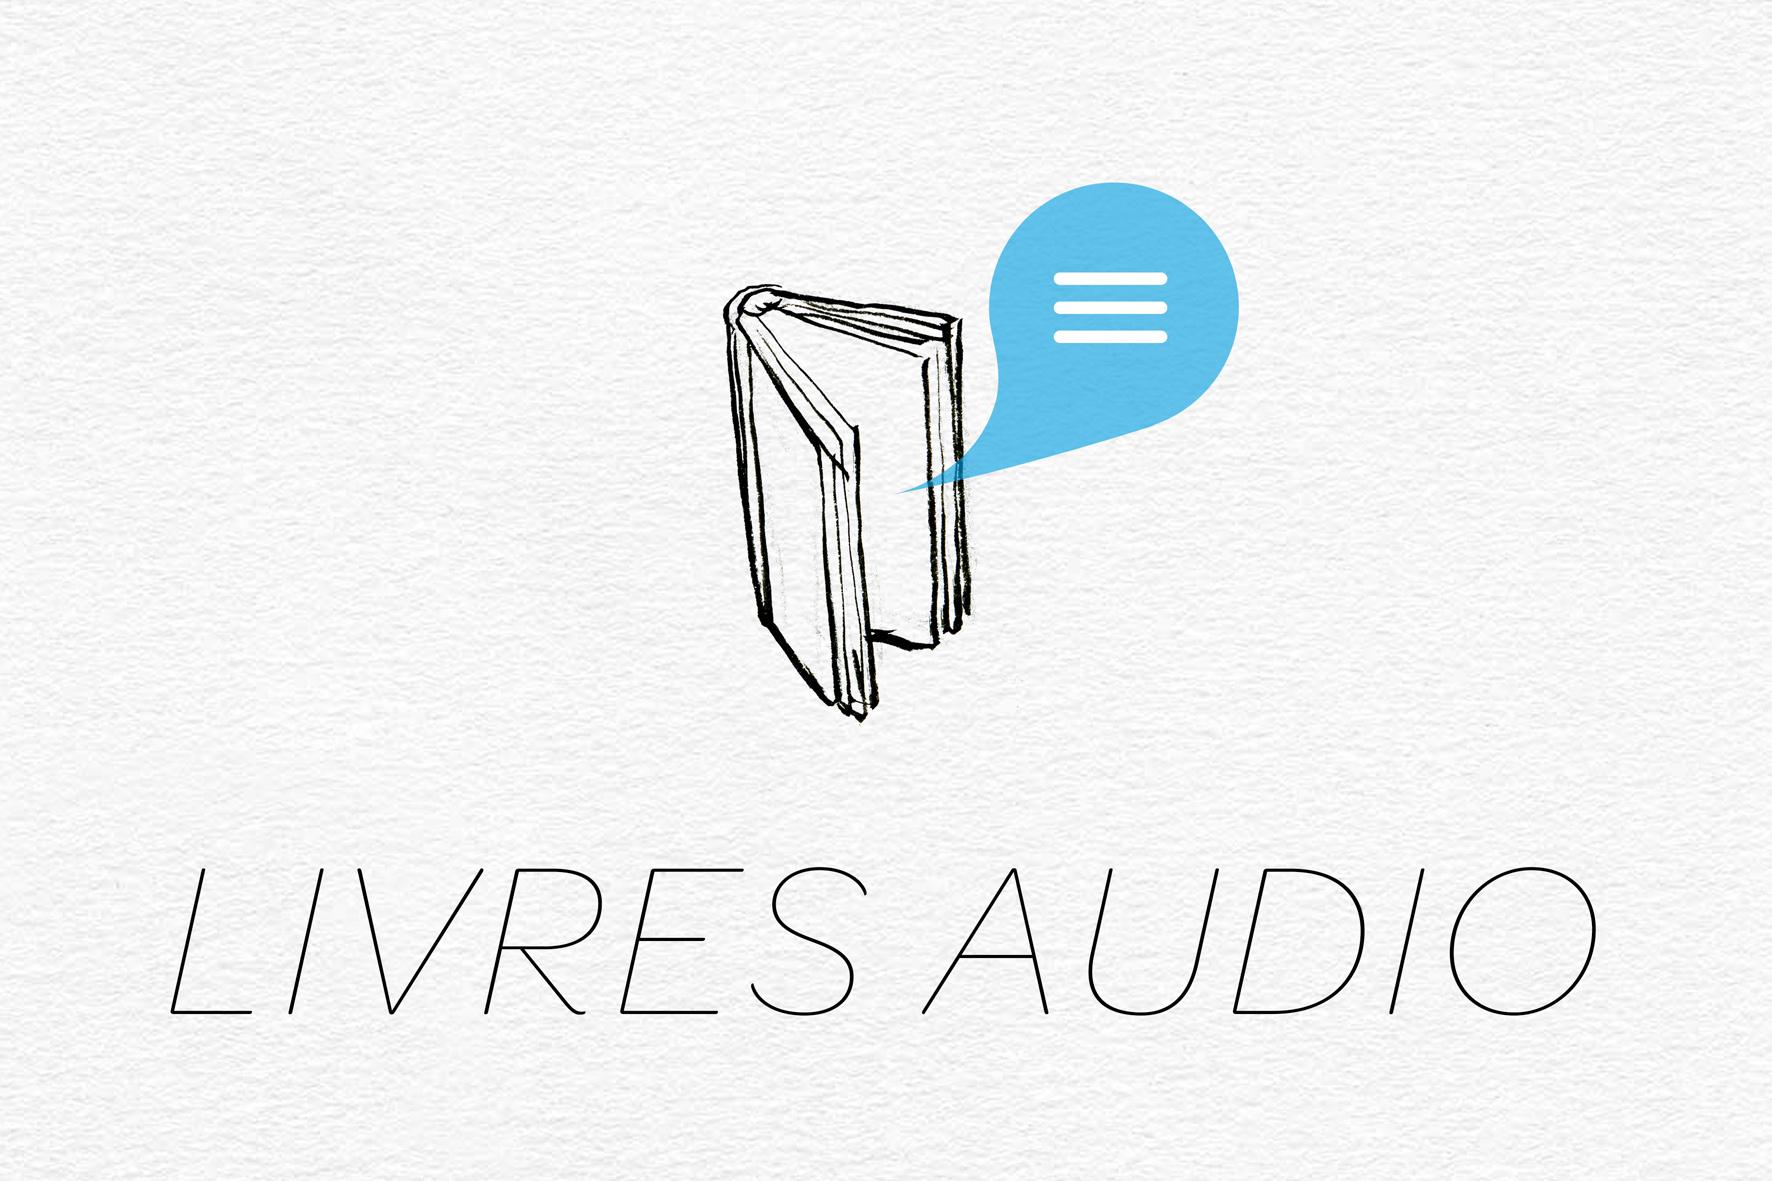 Maud Pictos_Livres Audio#01-2